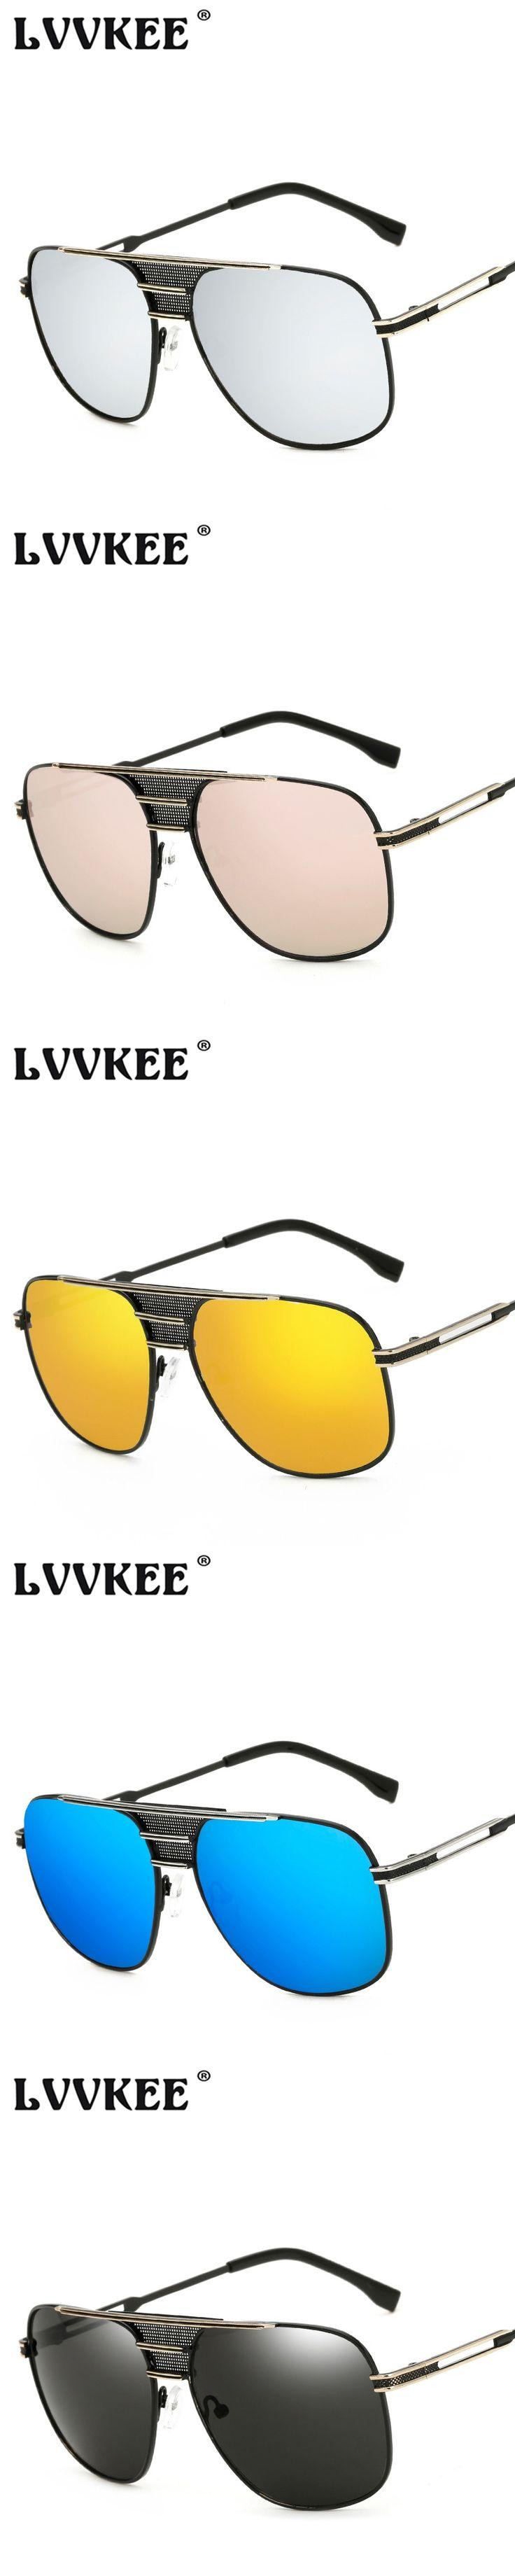 Hot sales 2017 Luxury Brand Design Oversized Women Sunglasses Vintage Metal Frame Men Sun Glasses uv400 Oculos De Sol Feminino